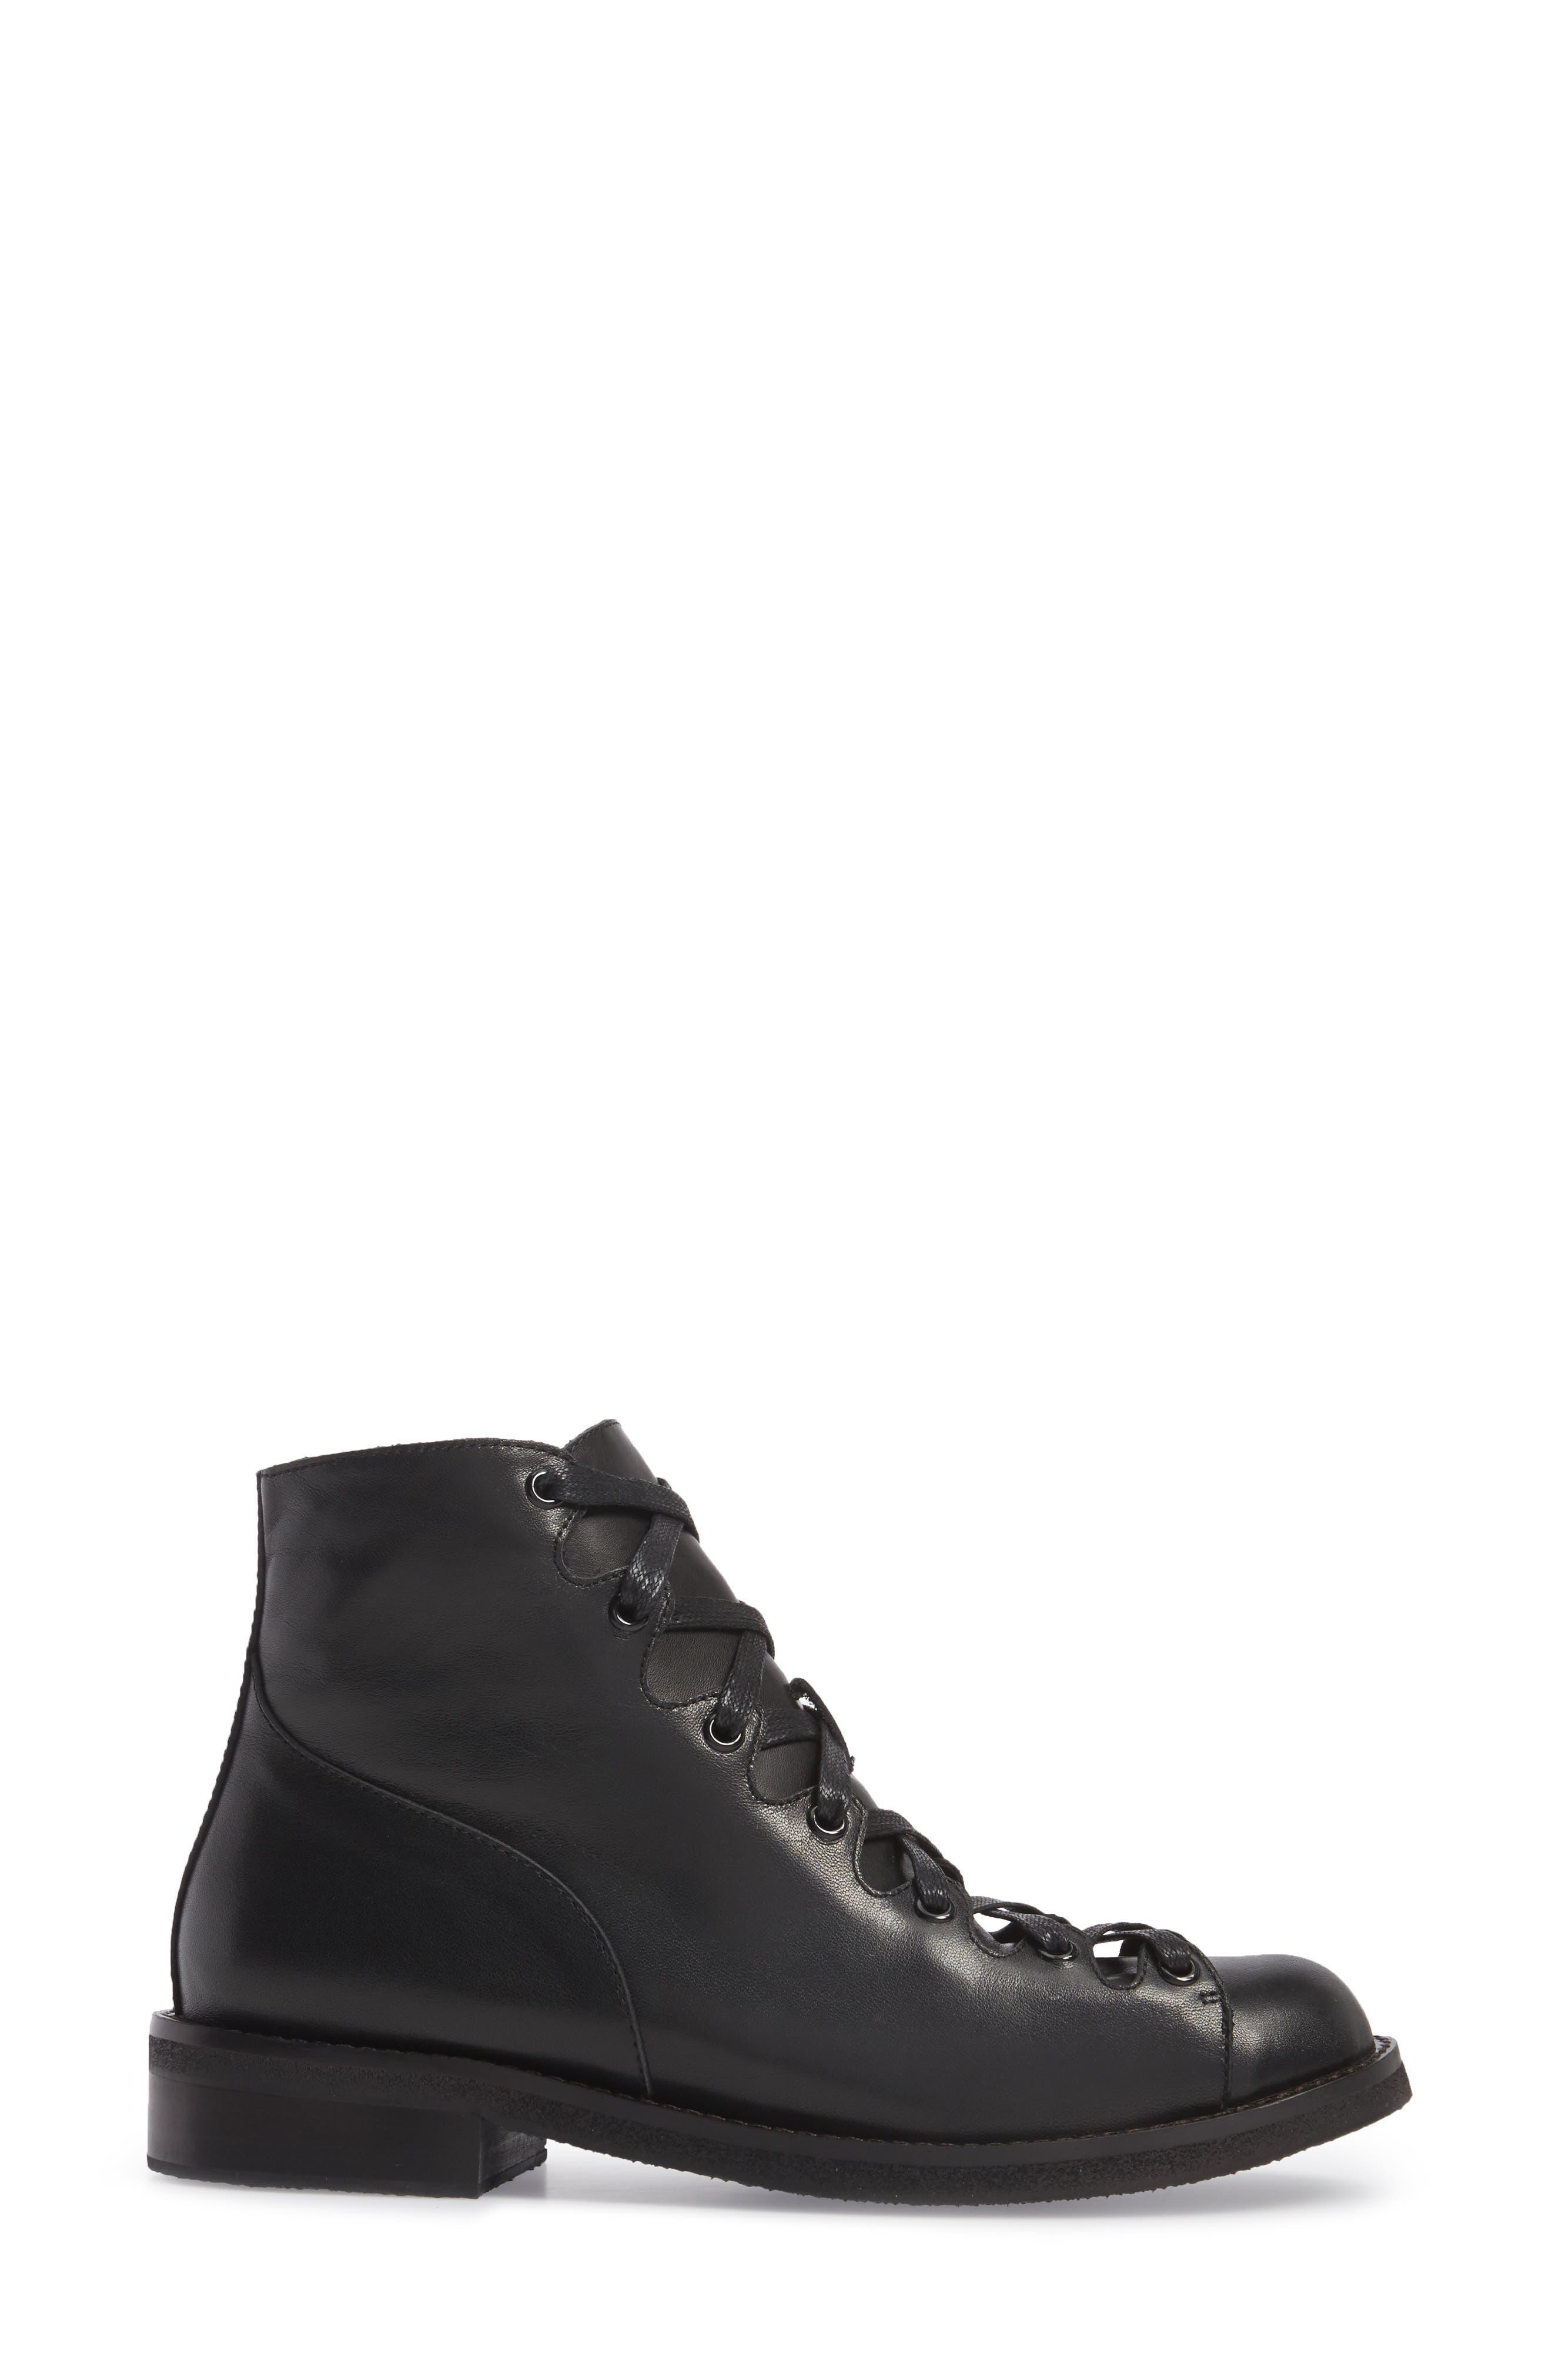 Jess Ghillie Combat Boot,                             Alternate thumbnail 3, color,                             001